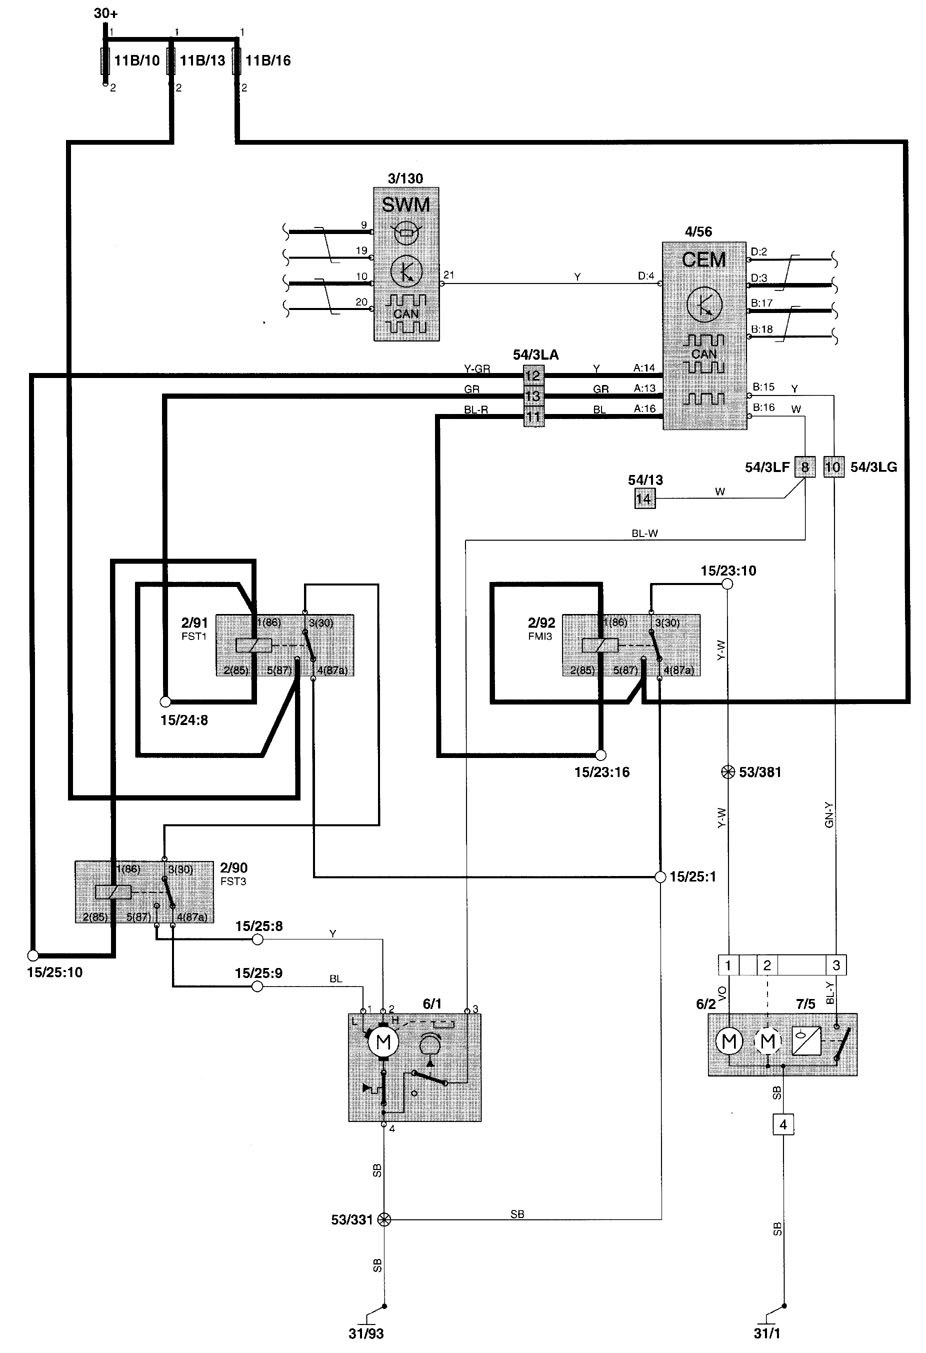 volvo v70  2001 - 2002  - wiring diagrams  washer